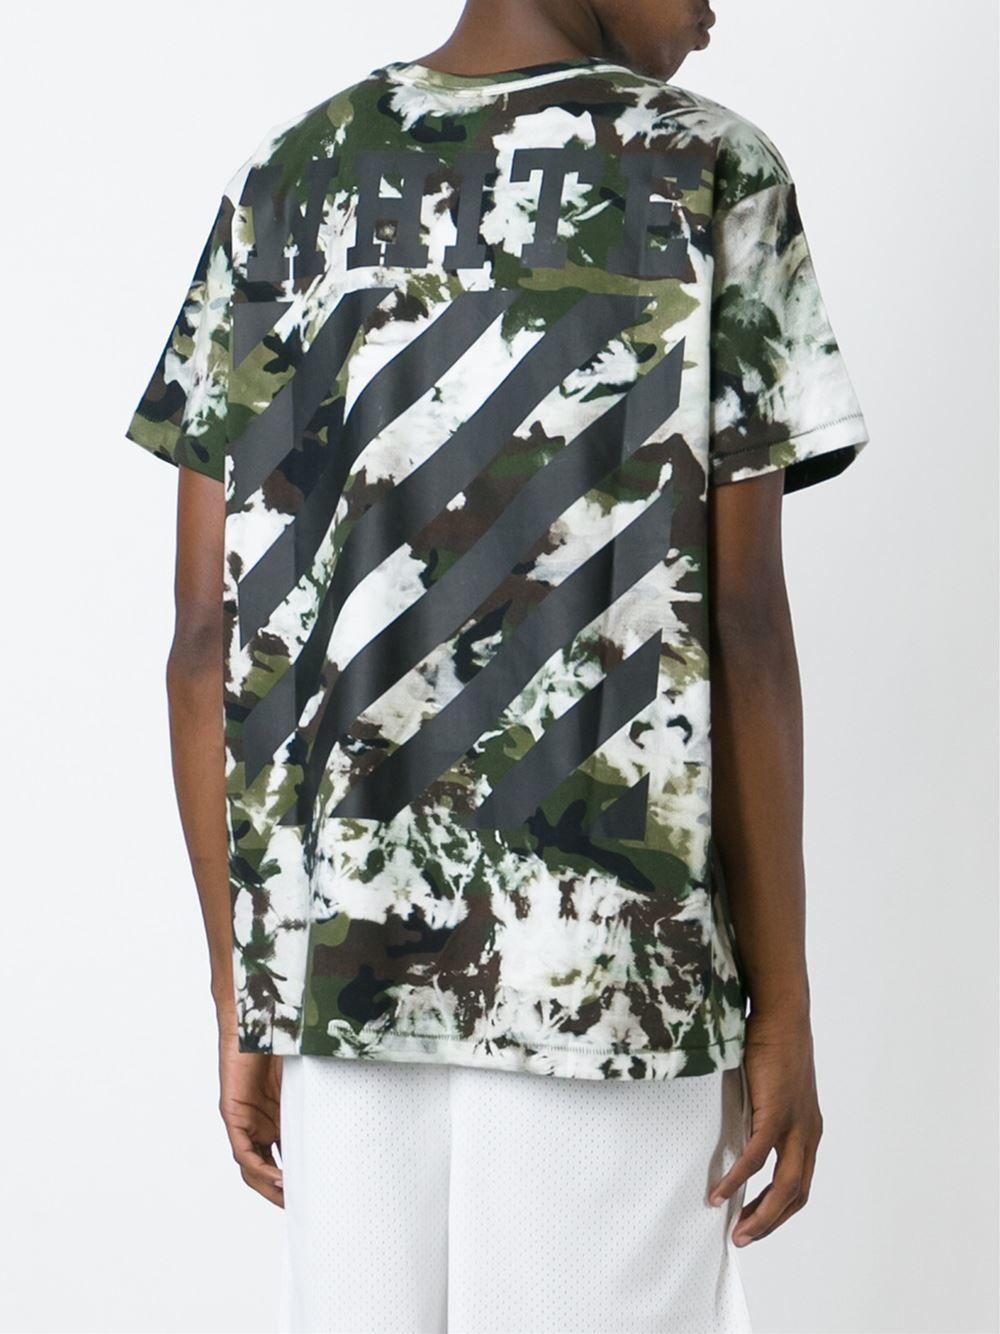 OFF-WHITE C/O VIRGIL ABLOH  /// Camo T-Shirts 2016 S/S - オフホワイトケアオブヴァージルアブロー カモ柄Tシャツ